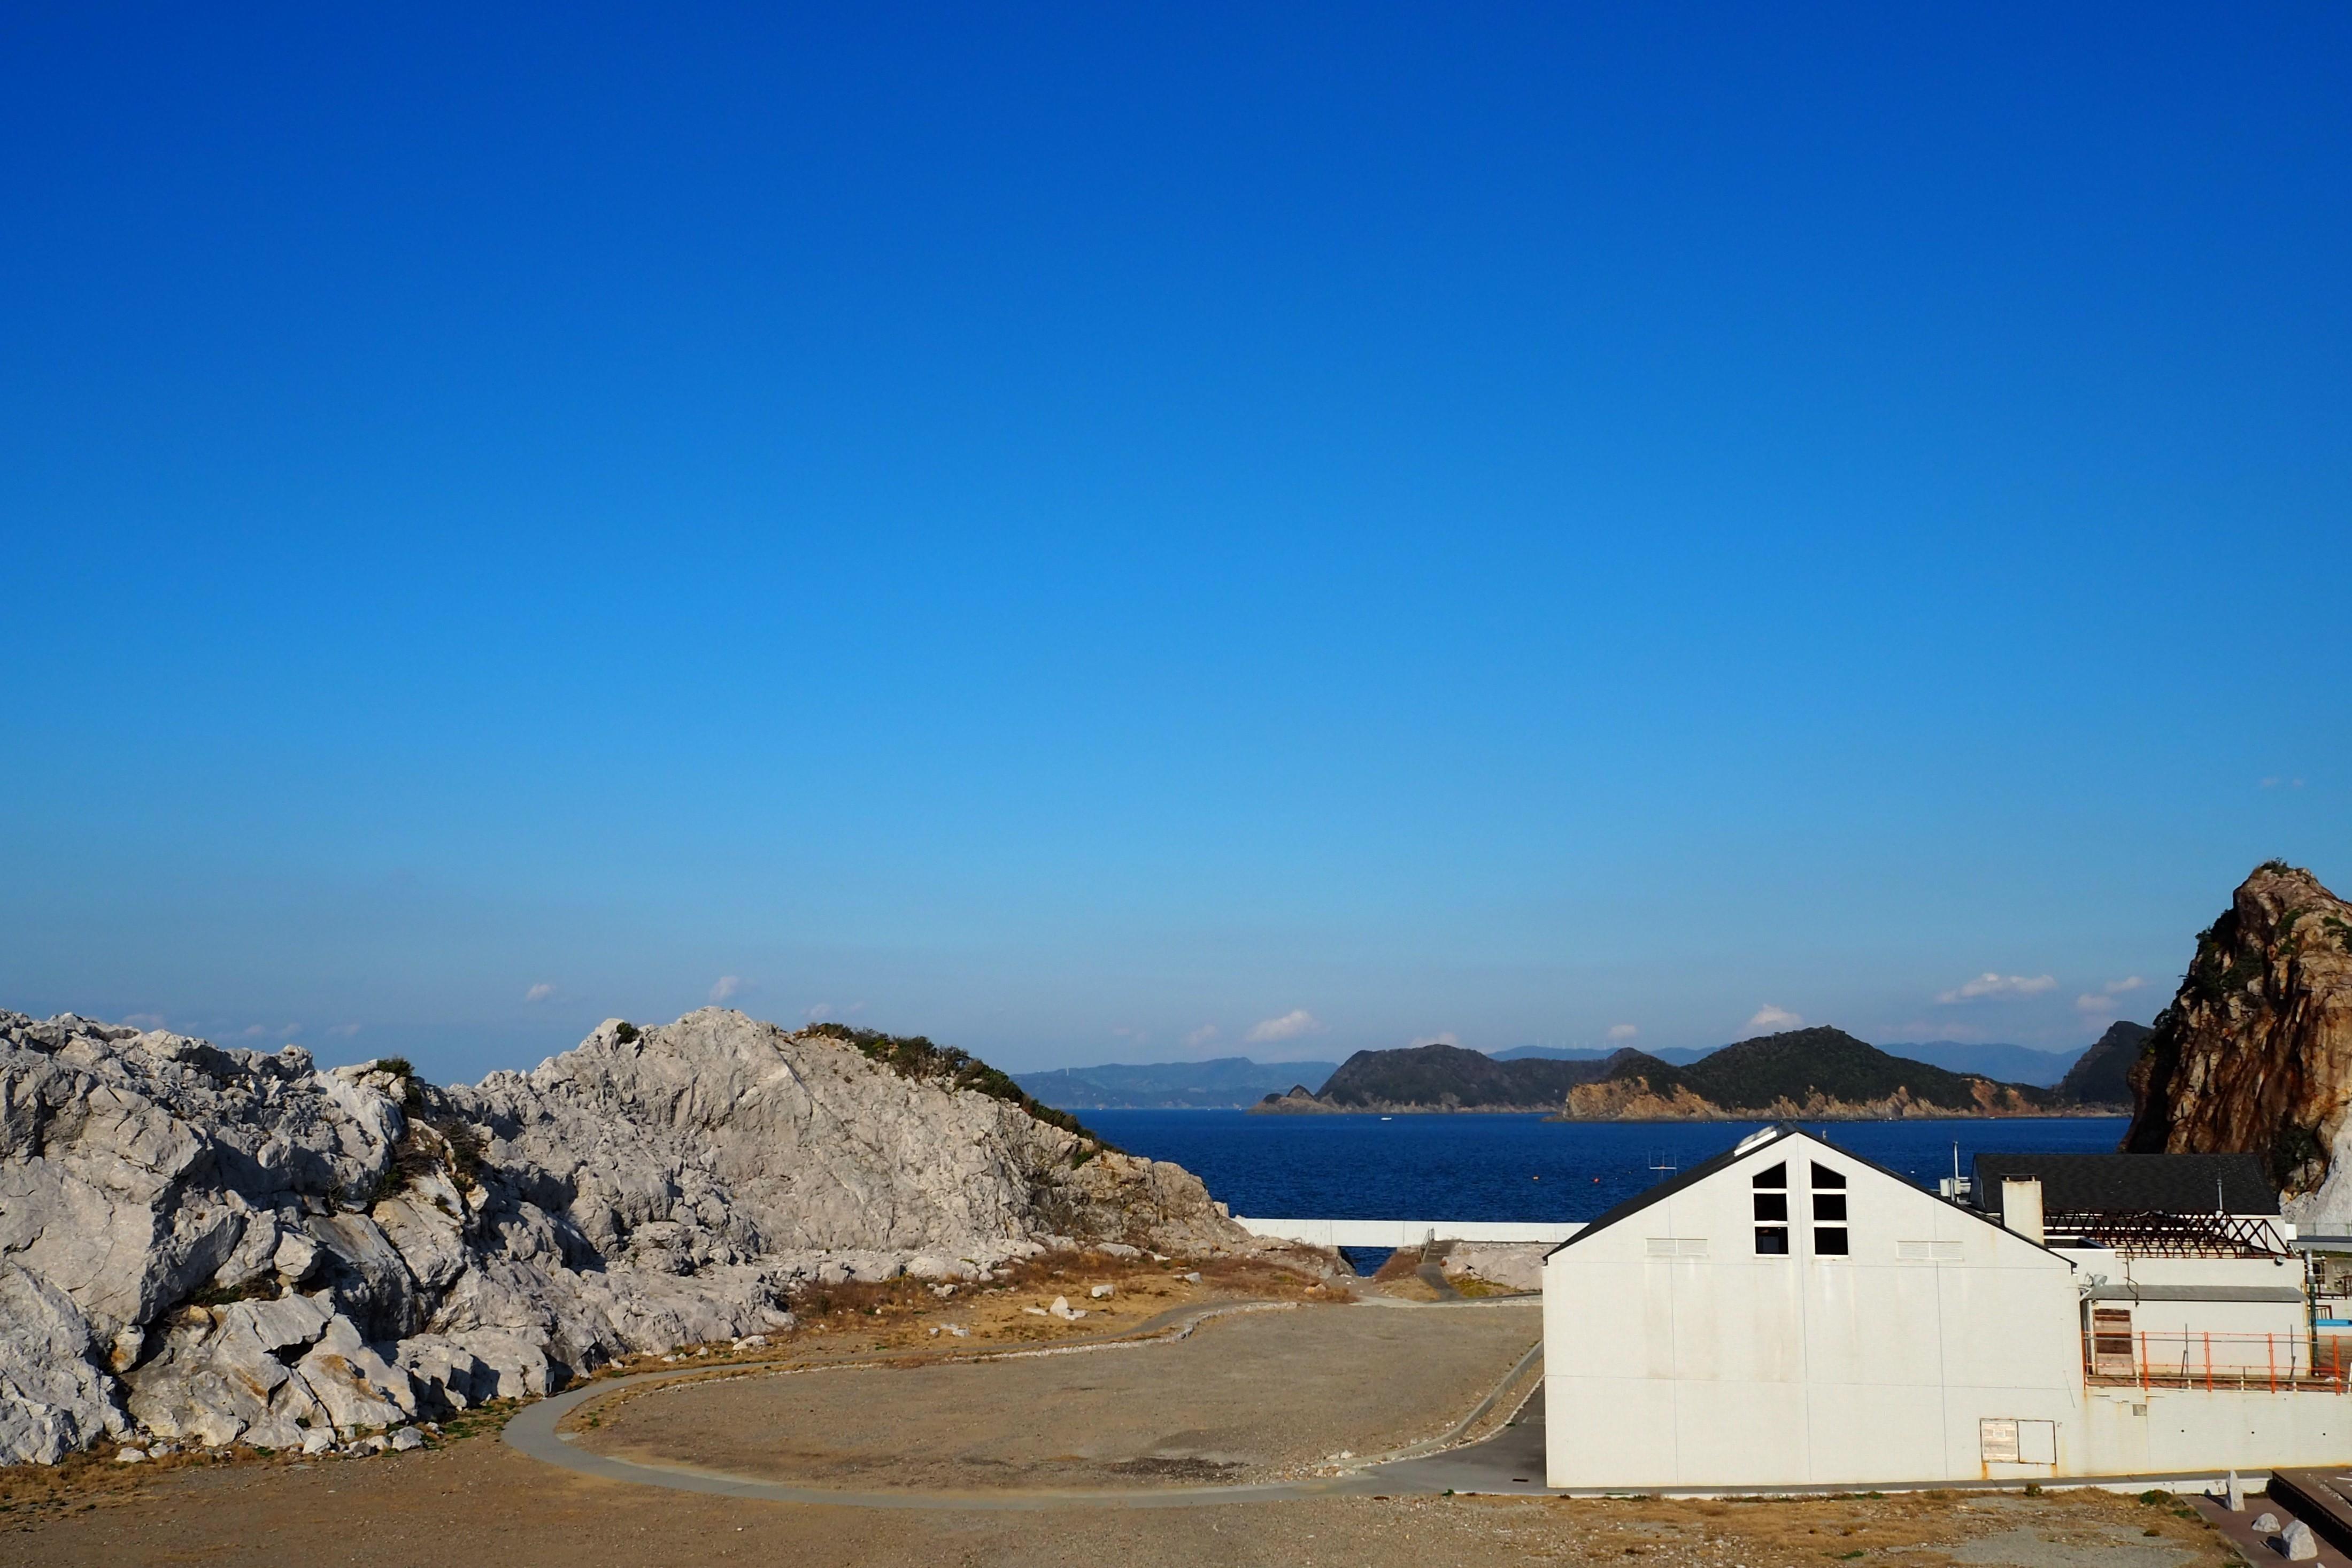 harleydavidson-motorcycle-touring-blog-shirasakioceanpark-oceanview-3.jpg